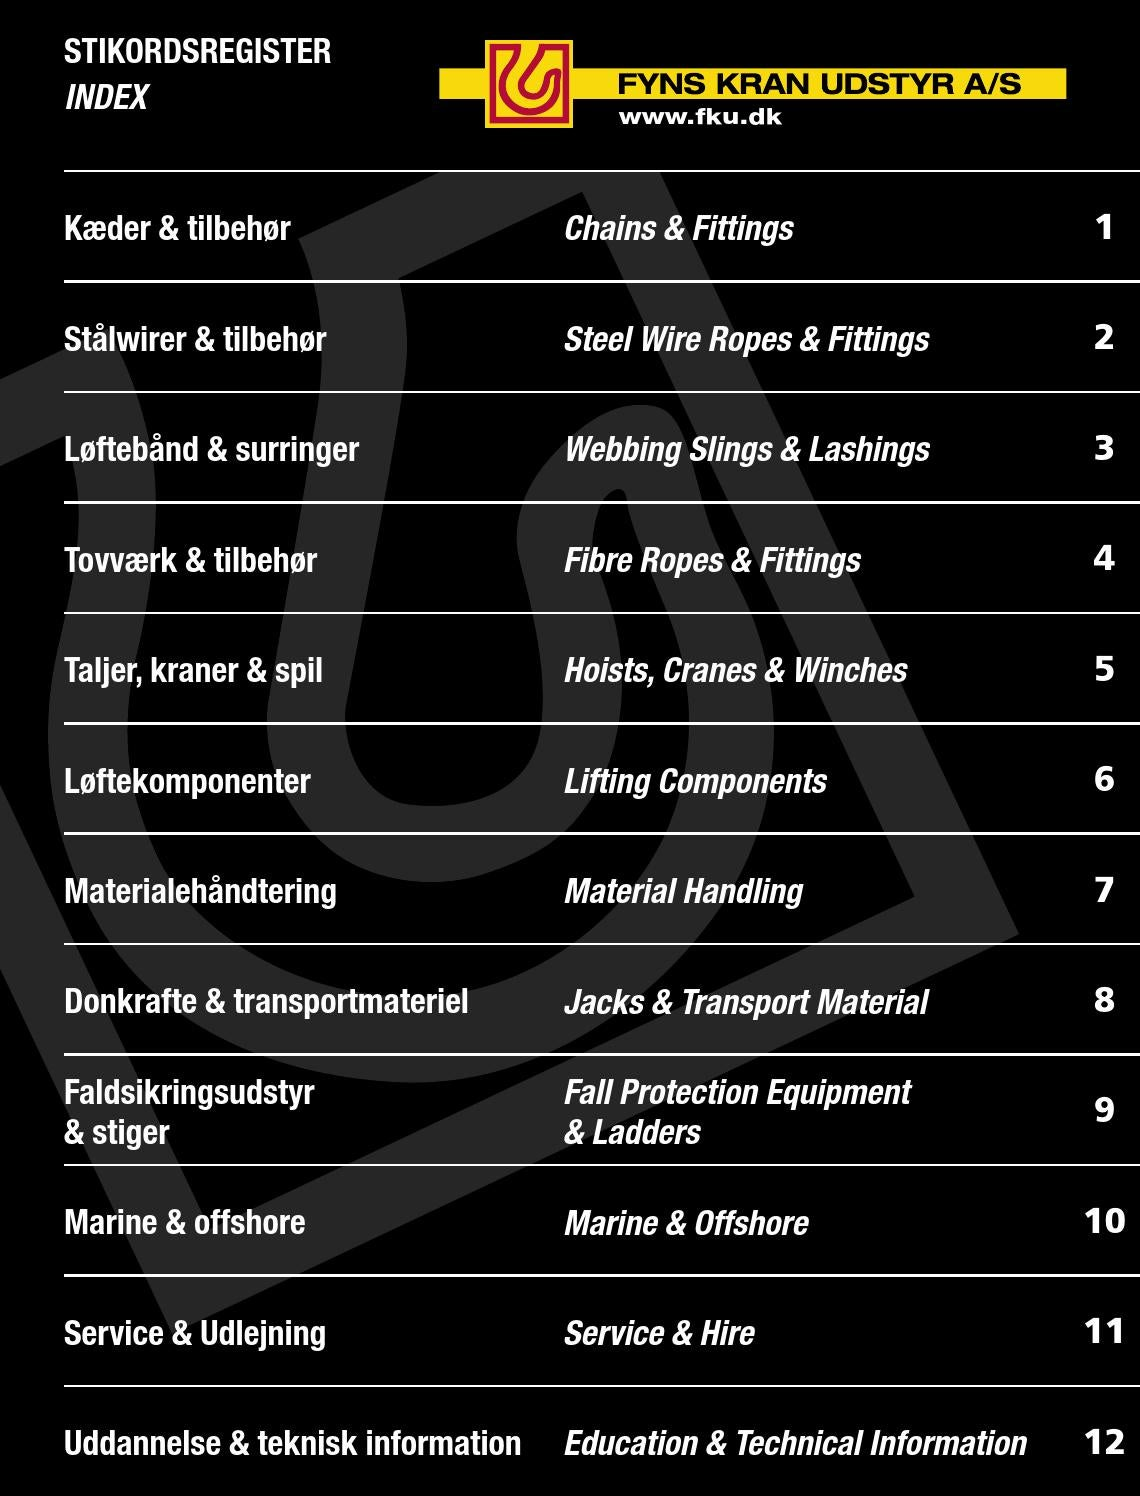 FKUkatalog Version 7.0 - 2013 by Fyns Kran Udstyr A/S - issuu